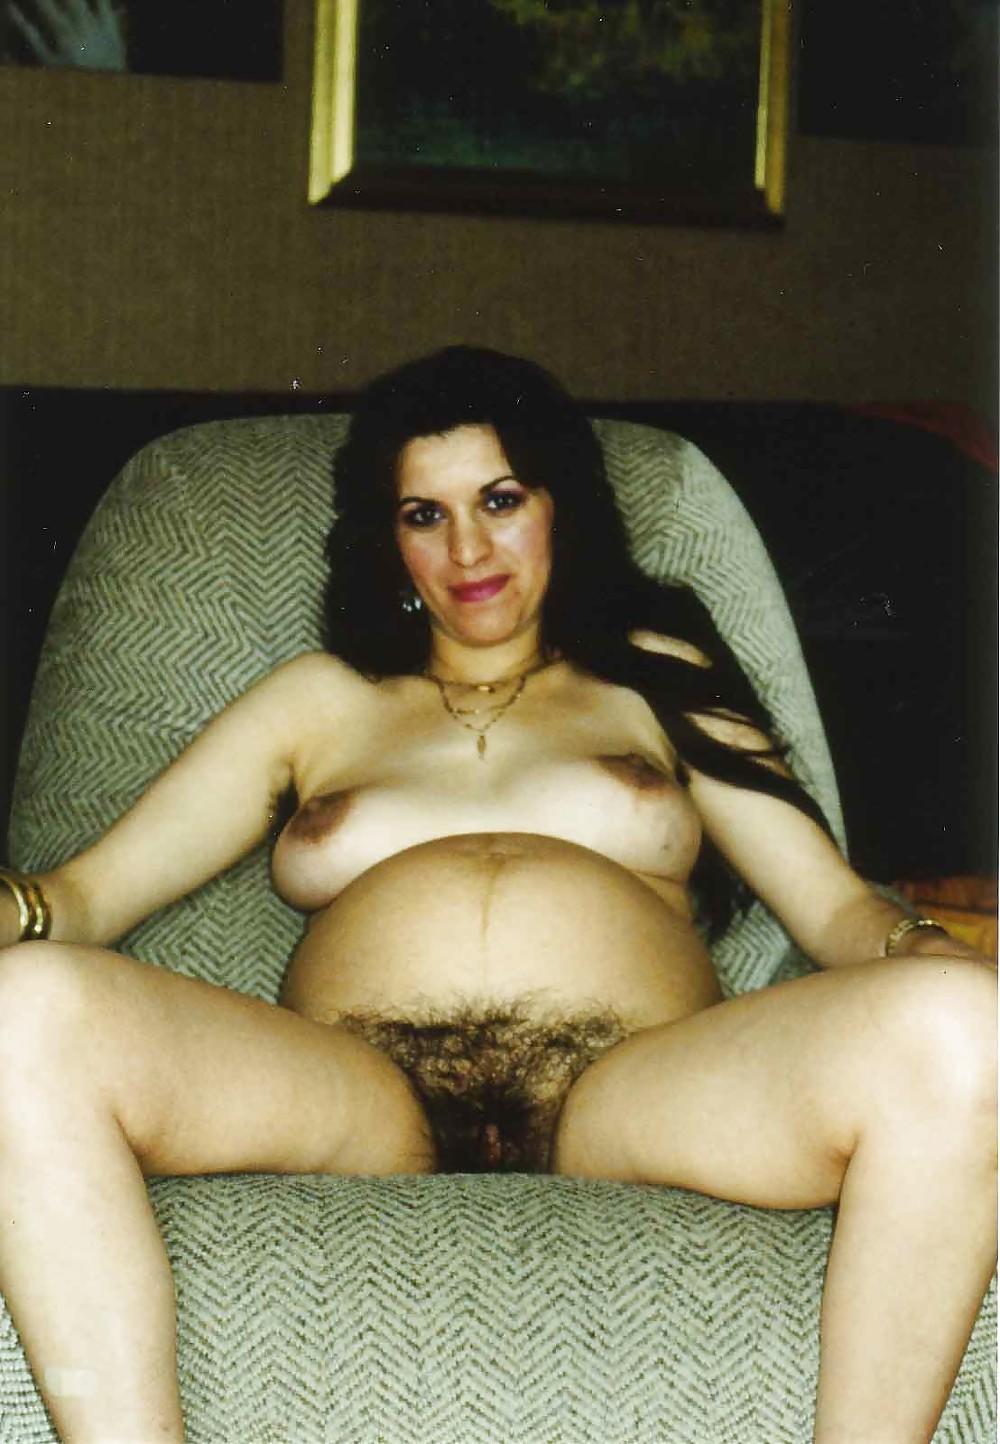 Young boy fuck aunt porn